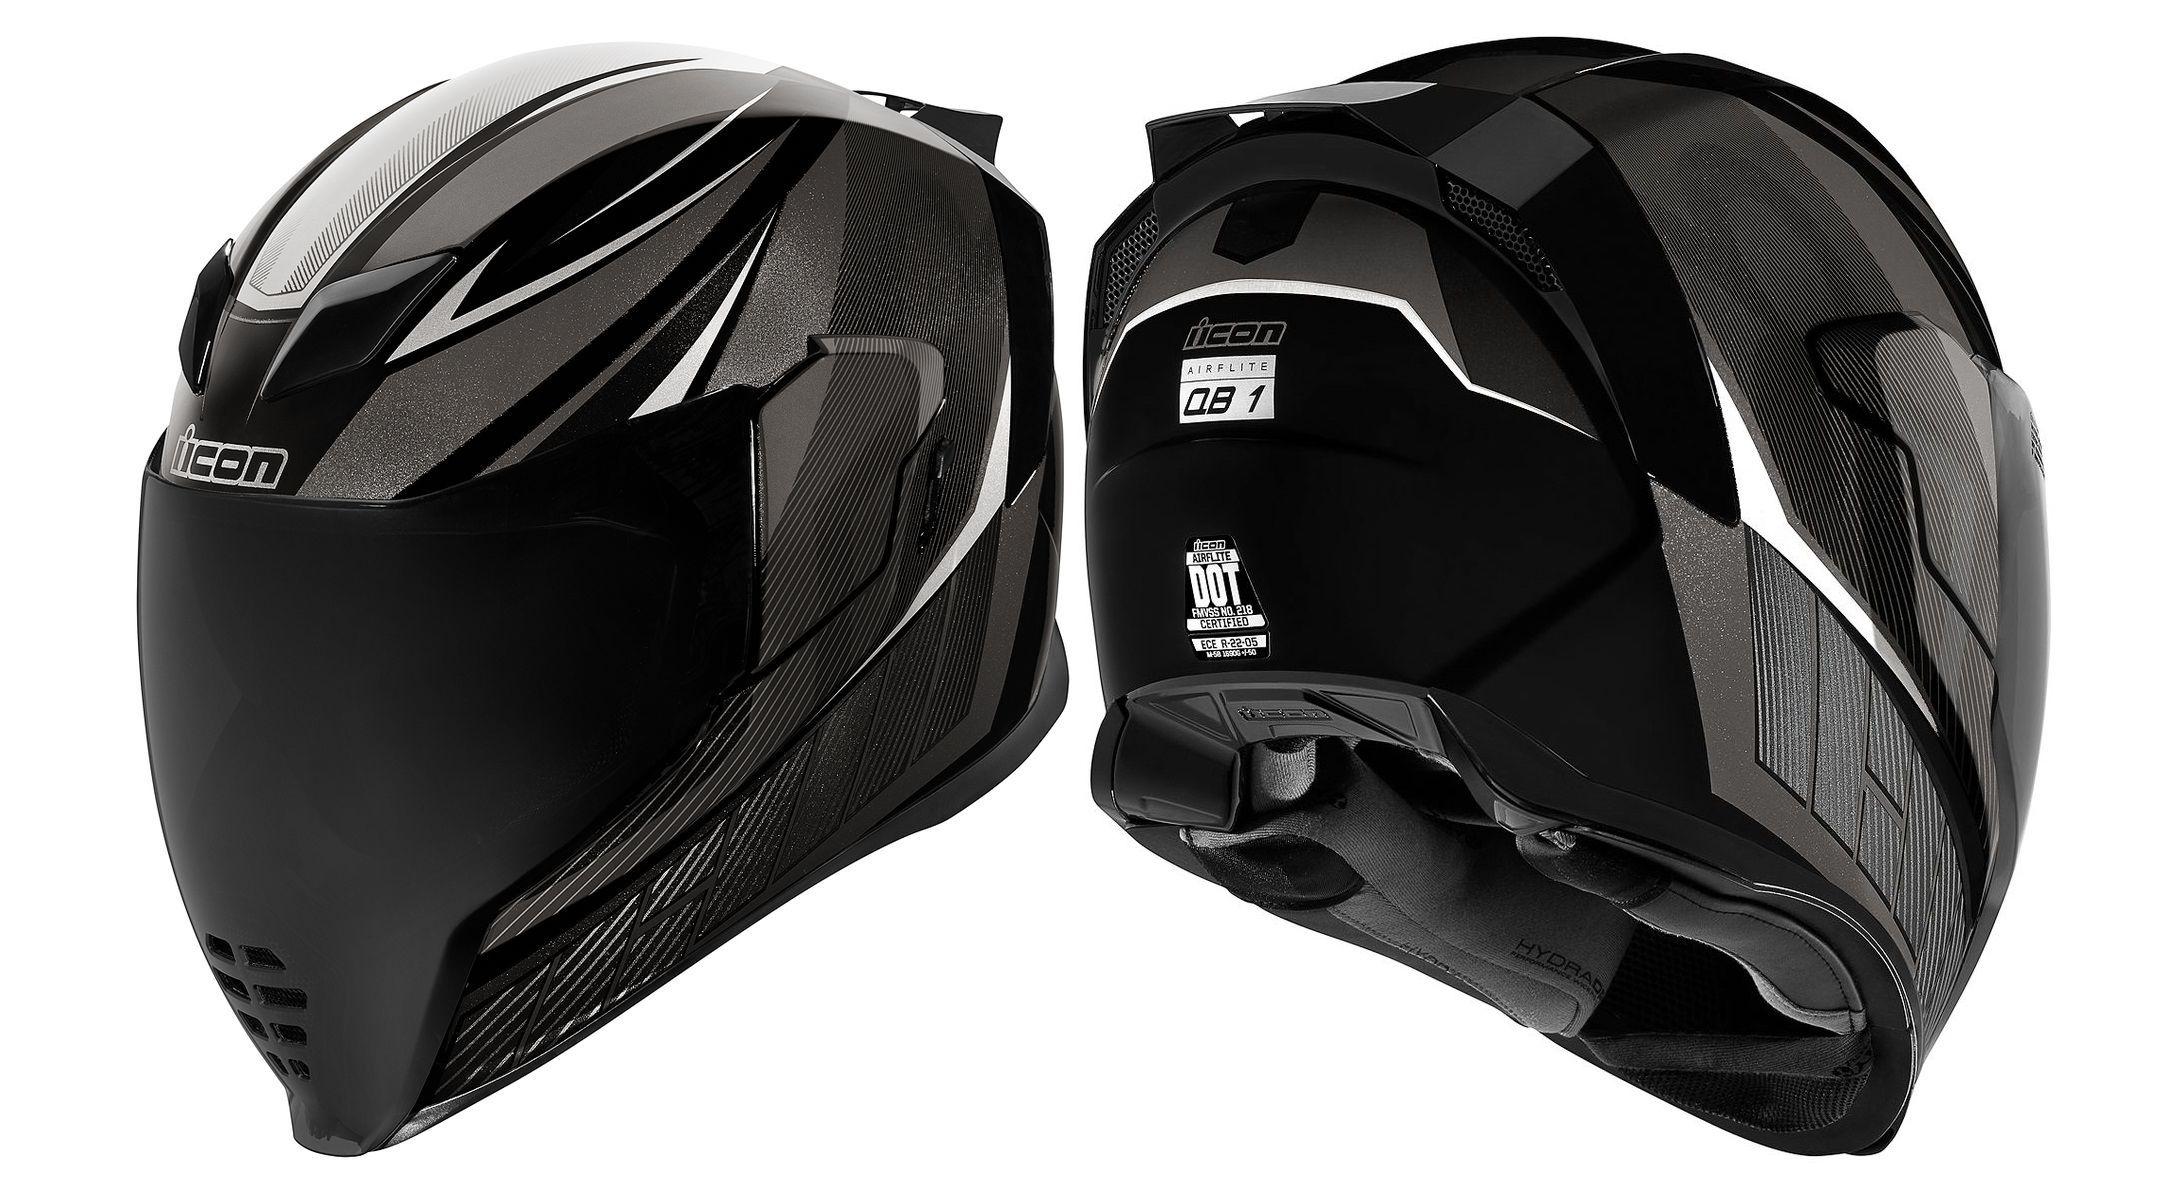 Icon Airflite Qb1 Helmet 285 Http Revzilla Com Motorcycle Icon Airflite Qb1 Helmet Motorcycle Icon Biker Accessories Motorcycle Helmets